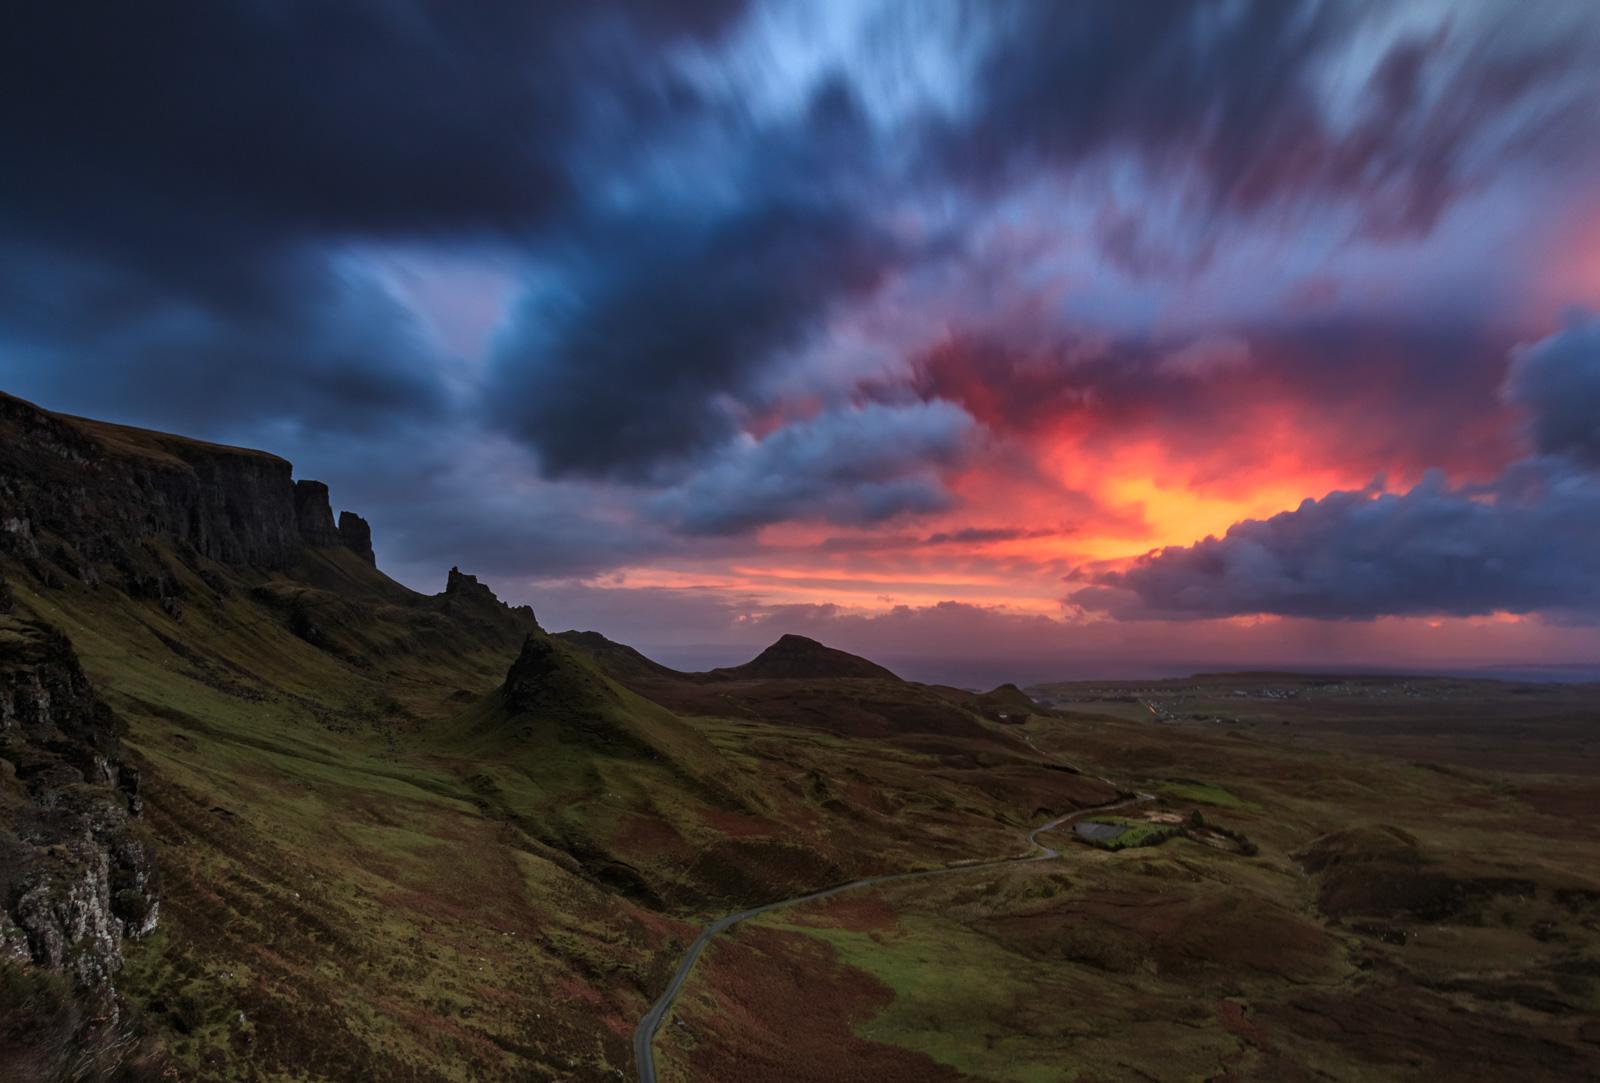 Der Himmel brennt – Sonnenaufgang am Quiraing